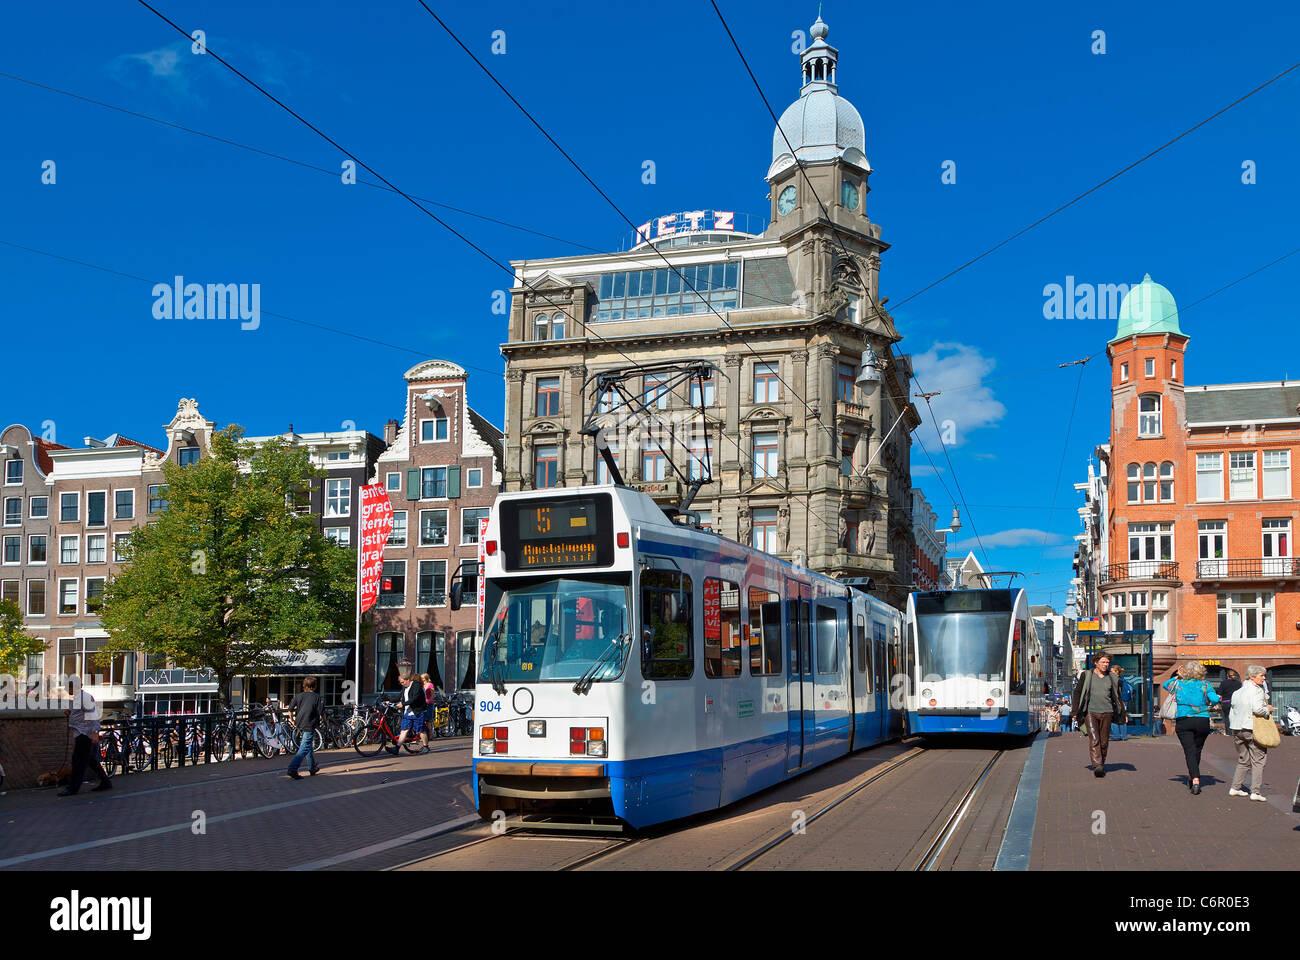 Europa, Paesi Bassi, tram in Amsterdam Immagini Stock